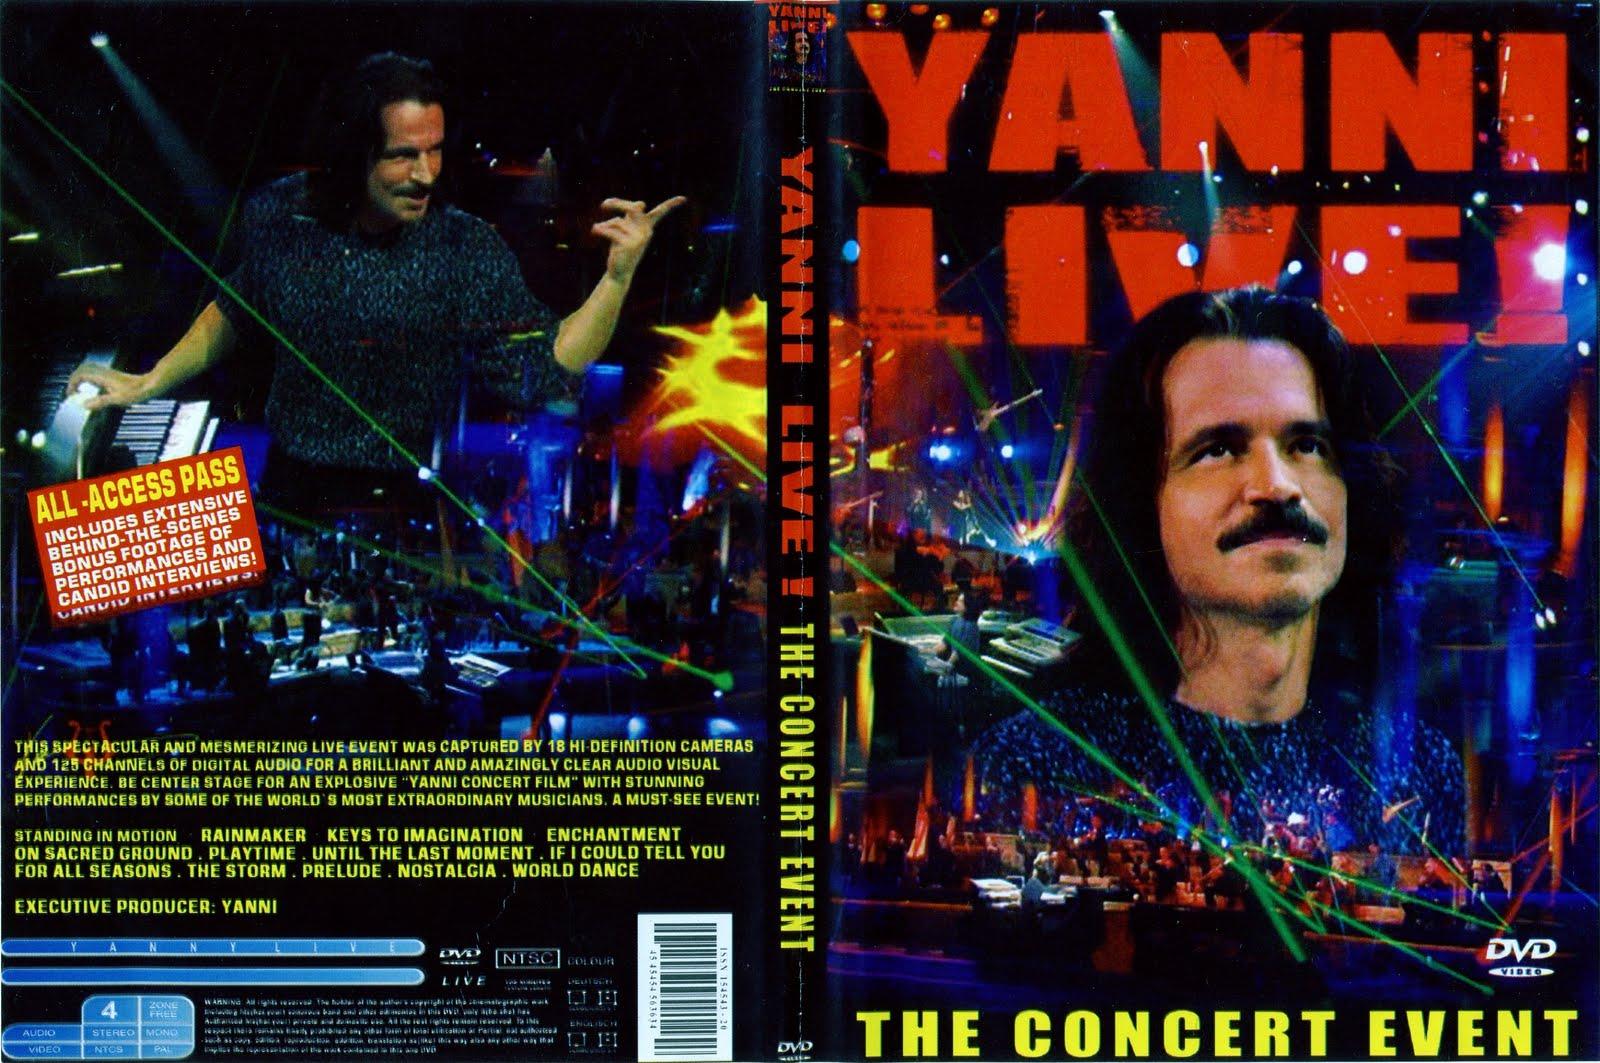 yanni the concert event dvd: